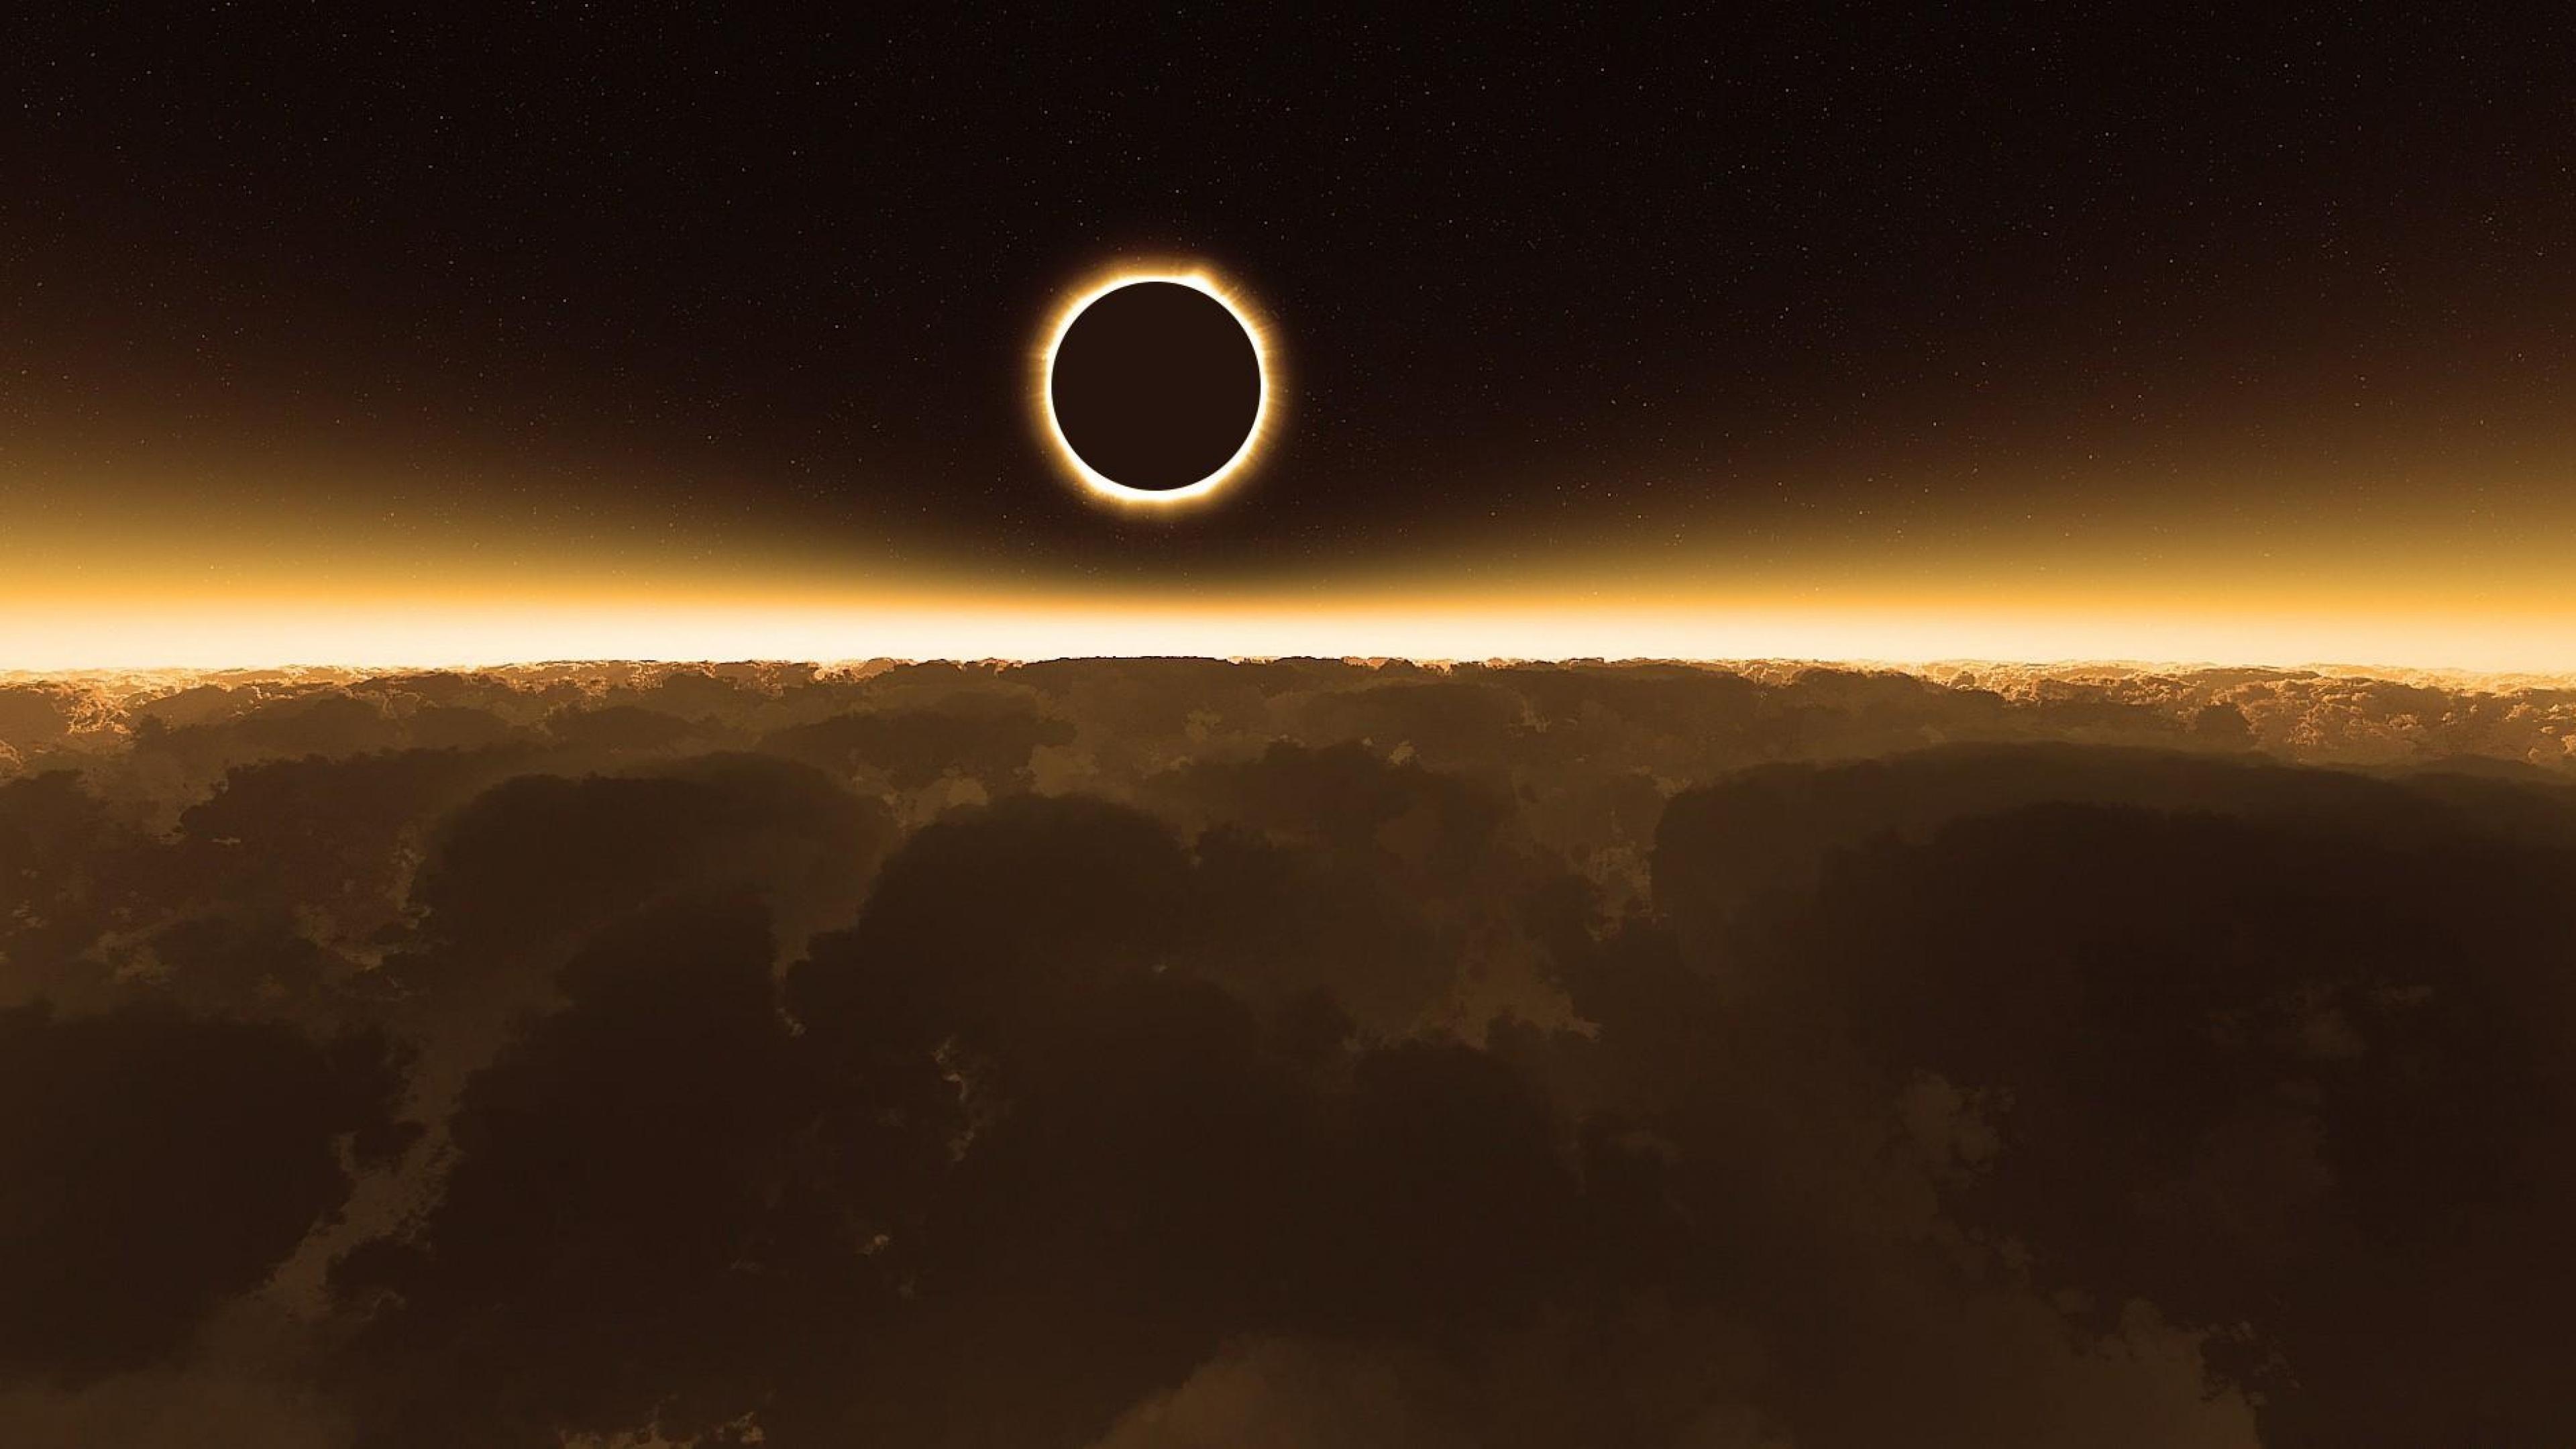 Cosmos Quotes Wallpaper Eclipse Wallpapers Hd Pixelstalk Net